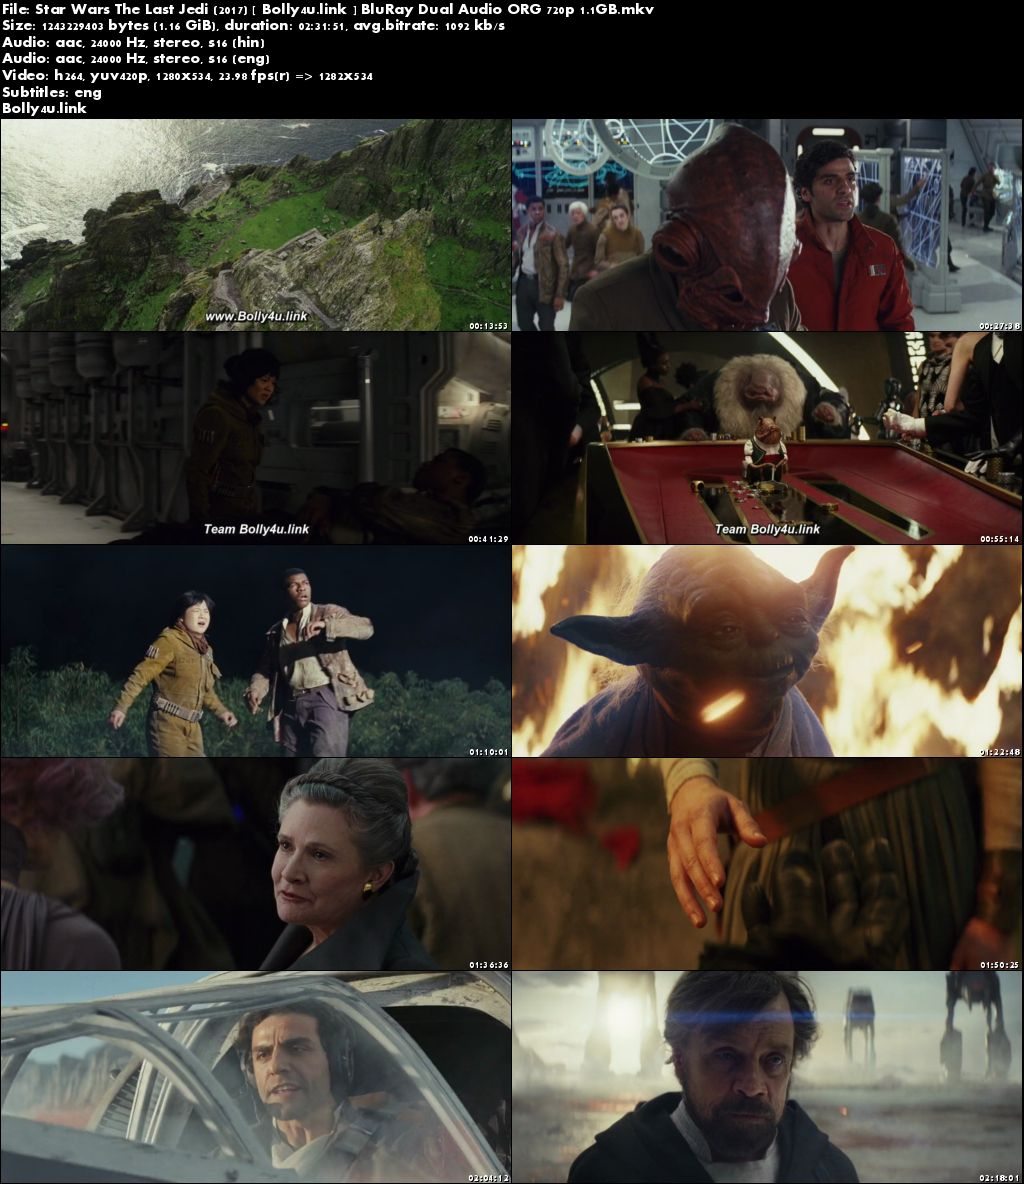 Star Wars The Last Jedi 2017 BluRay Hindi Dual Audio ORG 720p Download